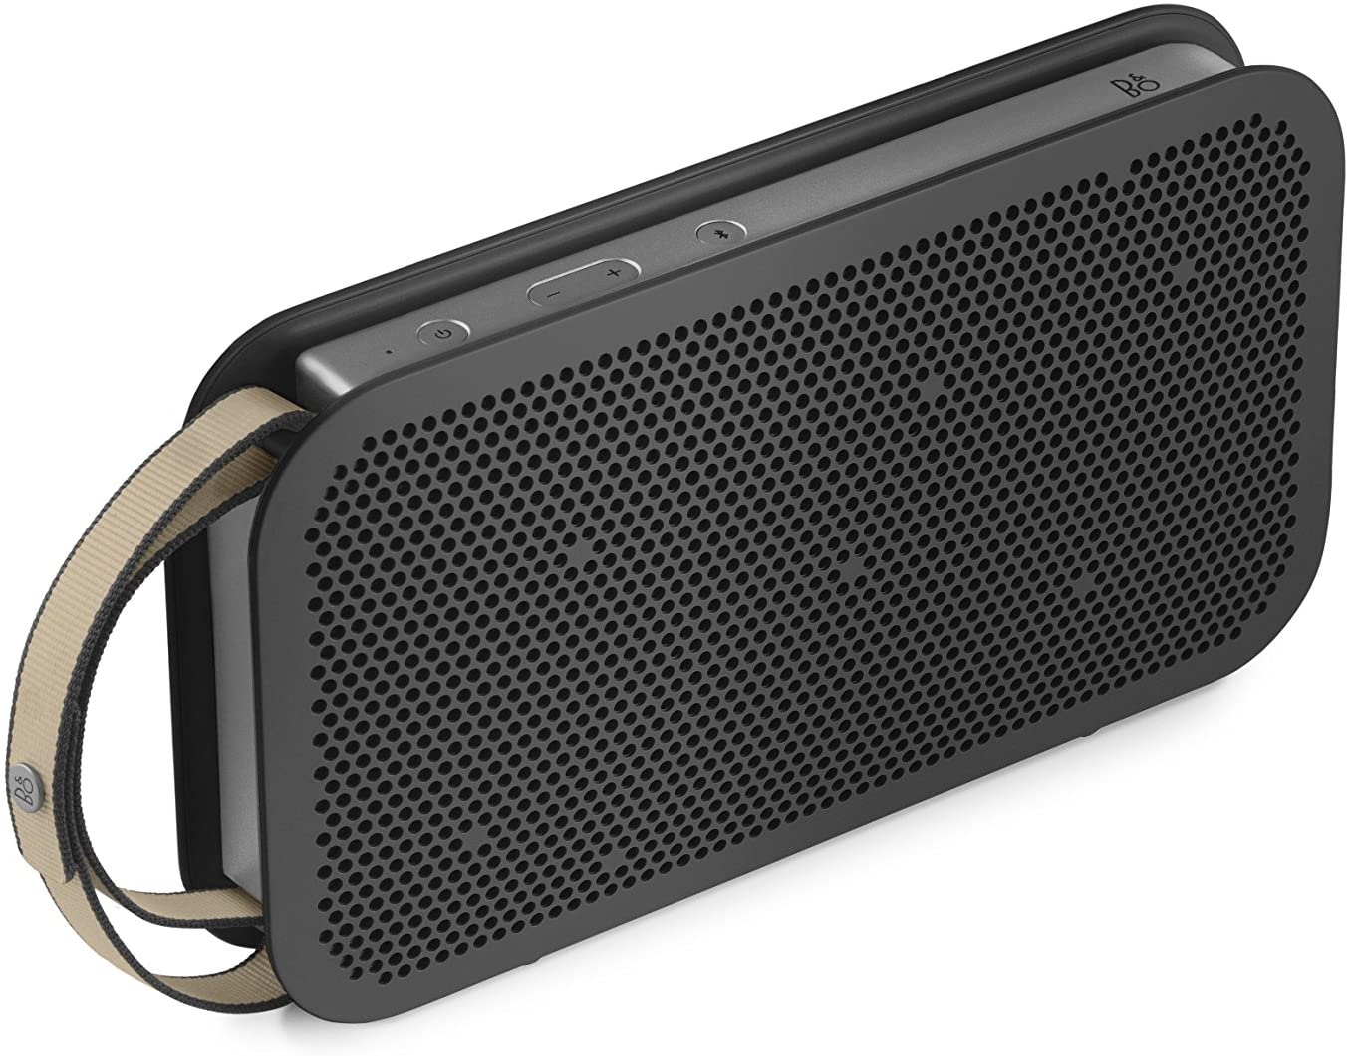 Bang & Olufsen Beoplay A2 Active - Altavoz portátil Bluetooth, Stone Gey: Amazon.es: Electrónica